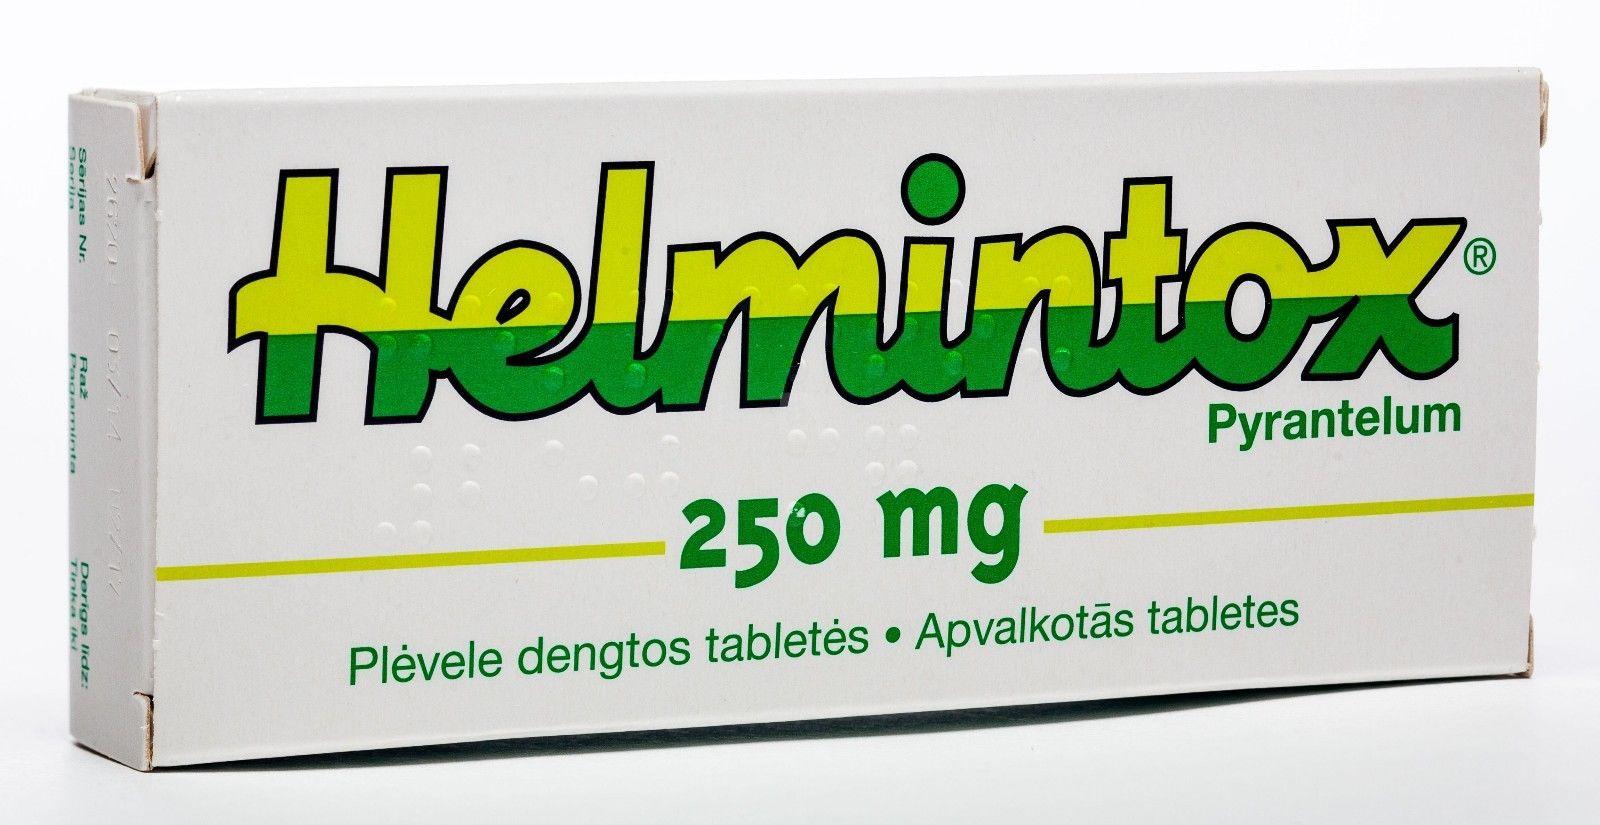 Helmintox sachet et allaitement, Helmintox mg инструкция Helmintox composition